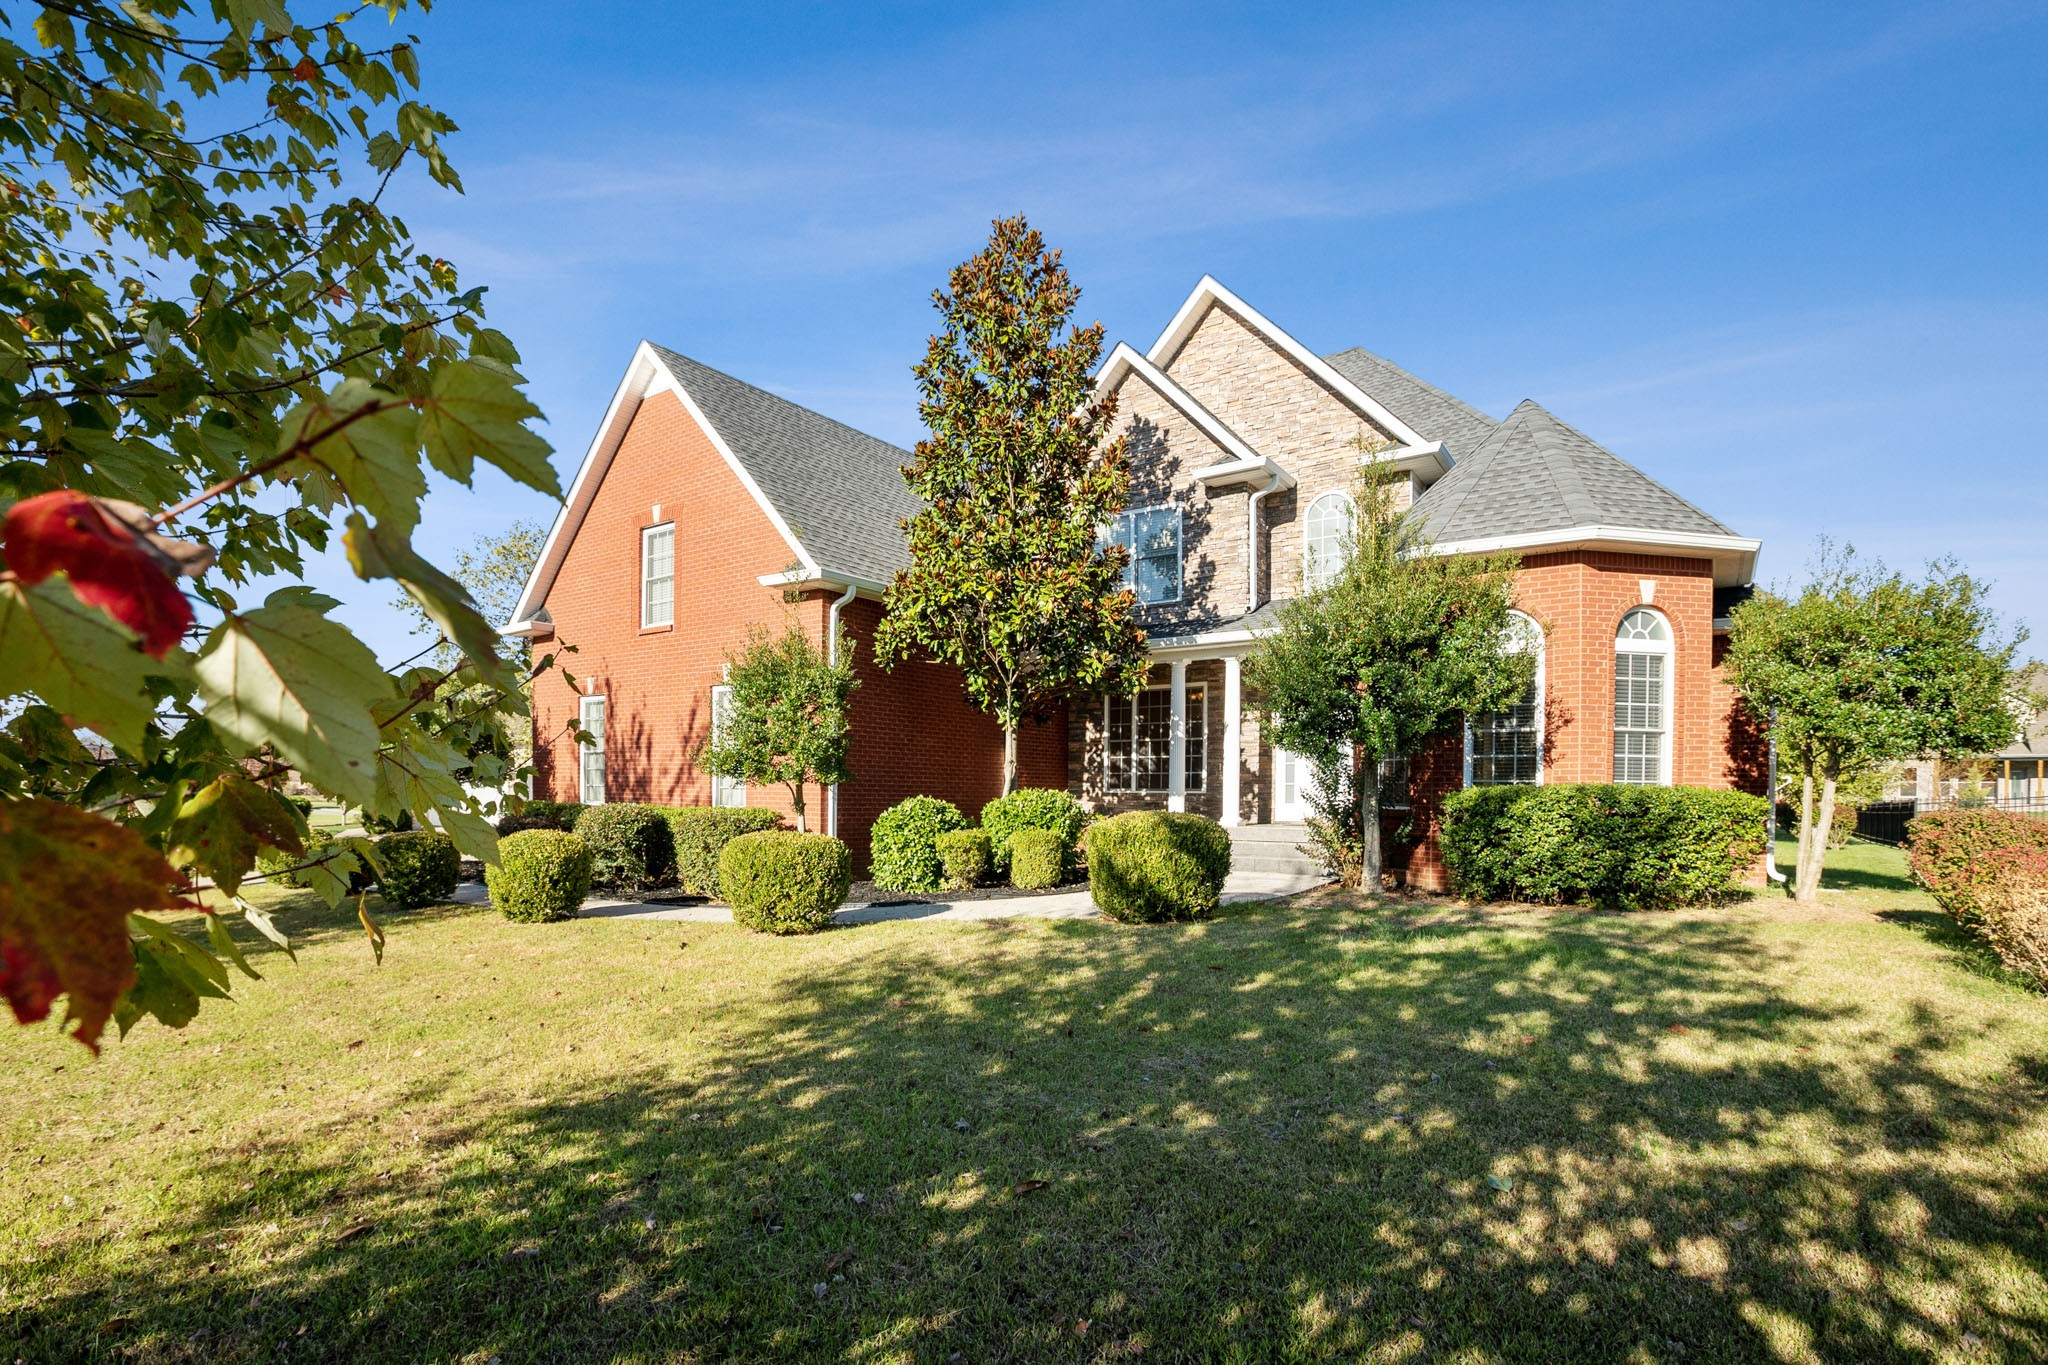 257 Gray Hawk Trail, Clarksville, TN 37043 - Clarksville, TN real estate listing